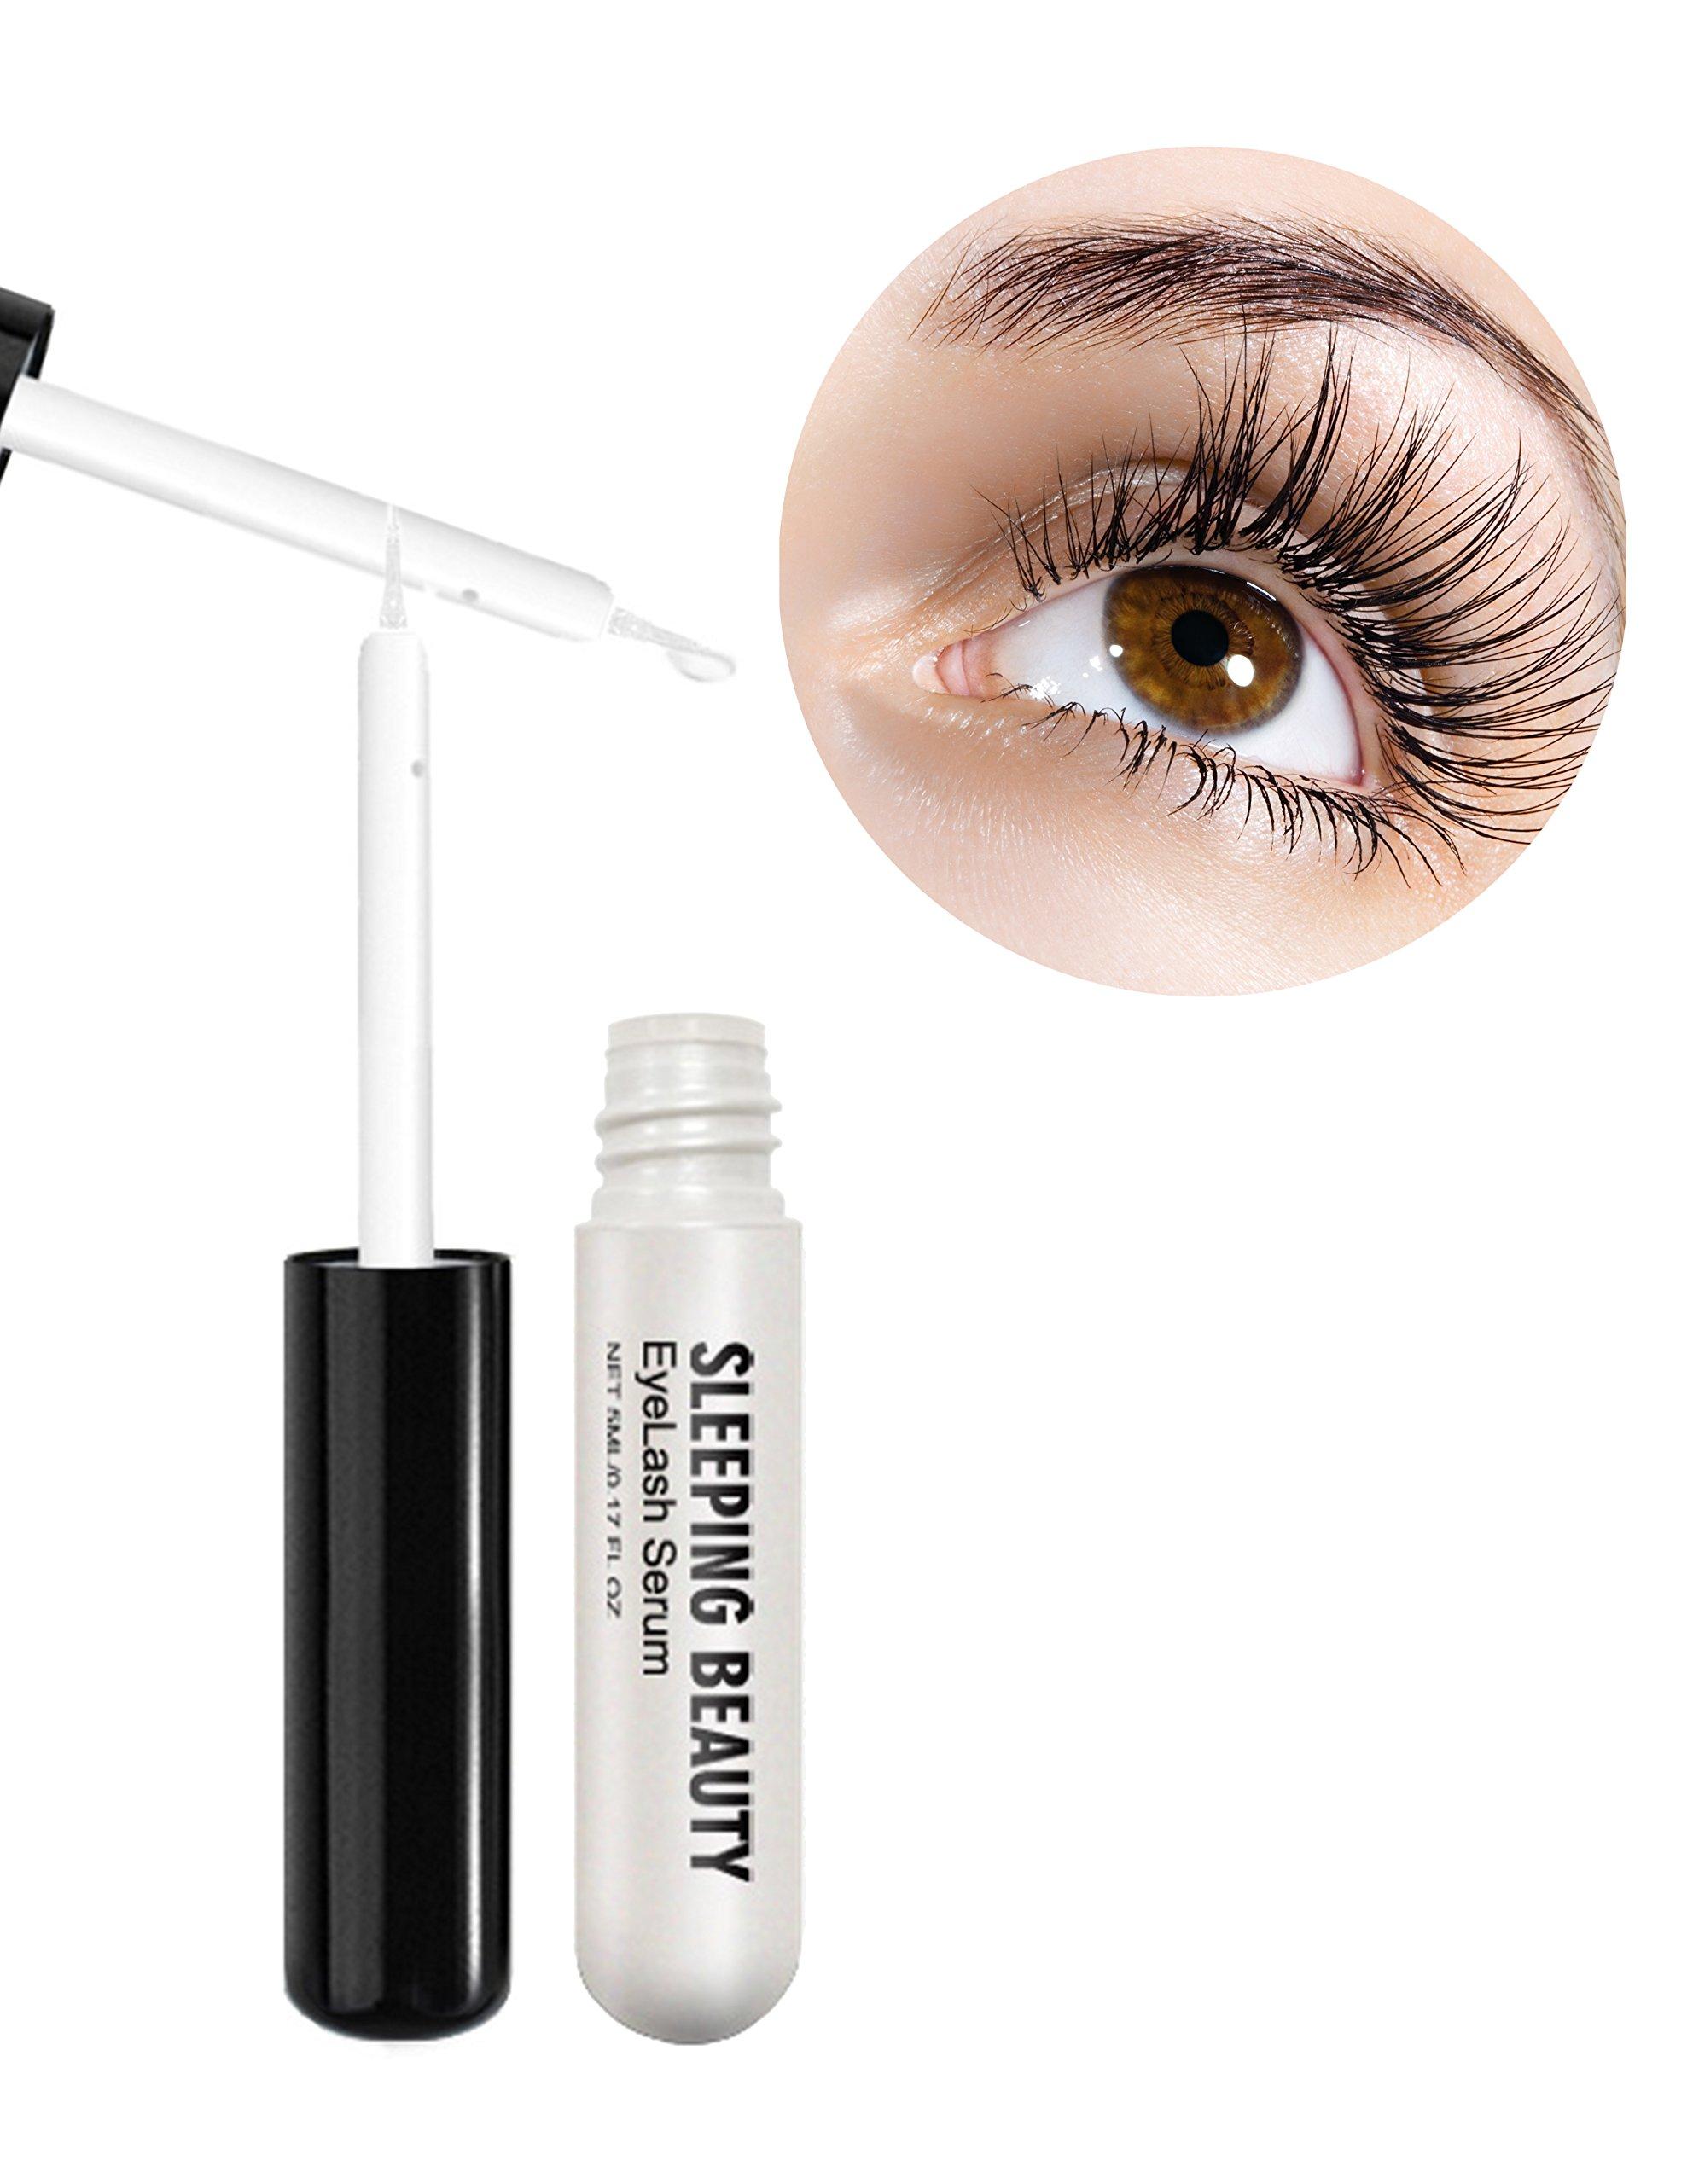 RealHer EYELASH KIT- ''Sleeping Beauty'' Eyelash Enhancing Serum & ''Faux Show' Latex Free Adhesive